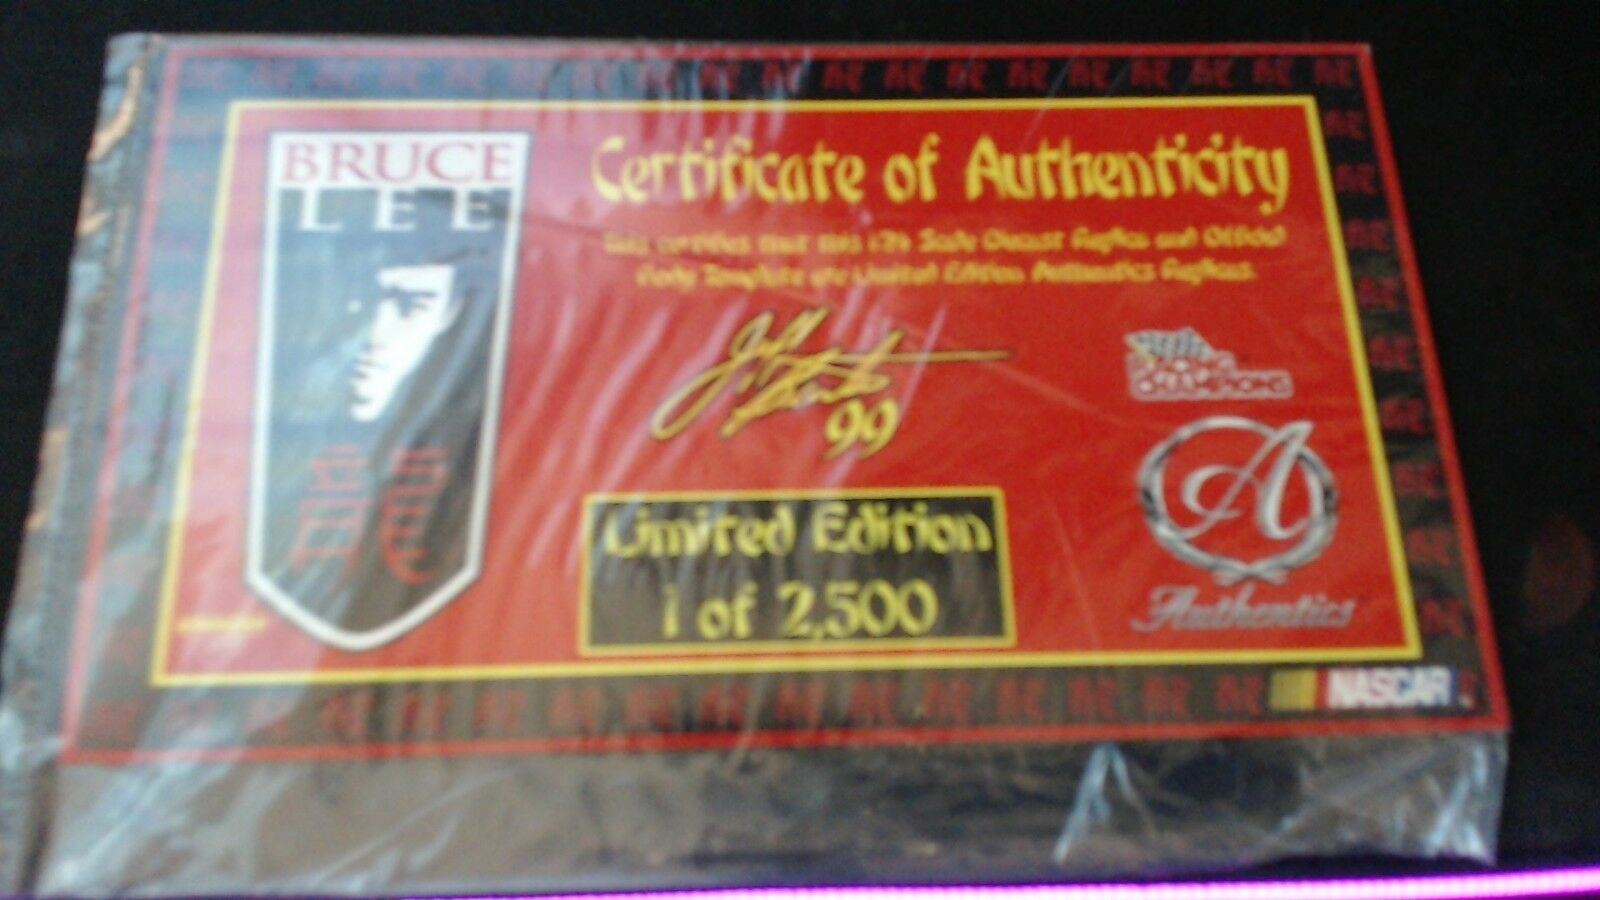 Racing Racing Racing Champions Authentics Jeff Burton Bruce Lee Ford Taurus 28f371